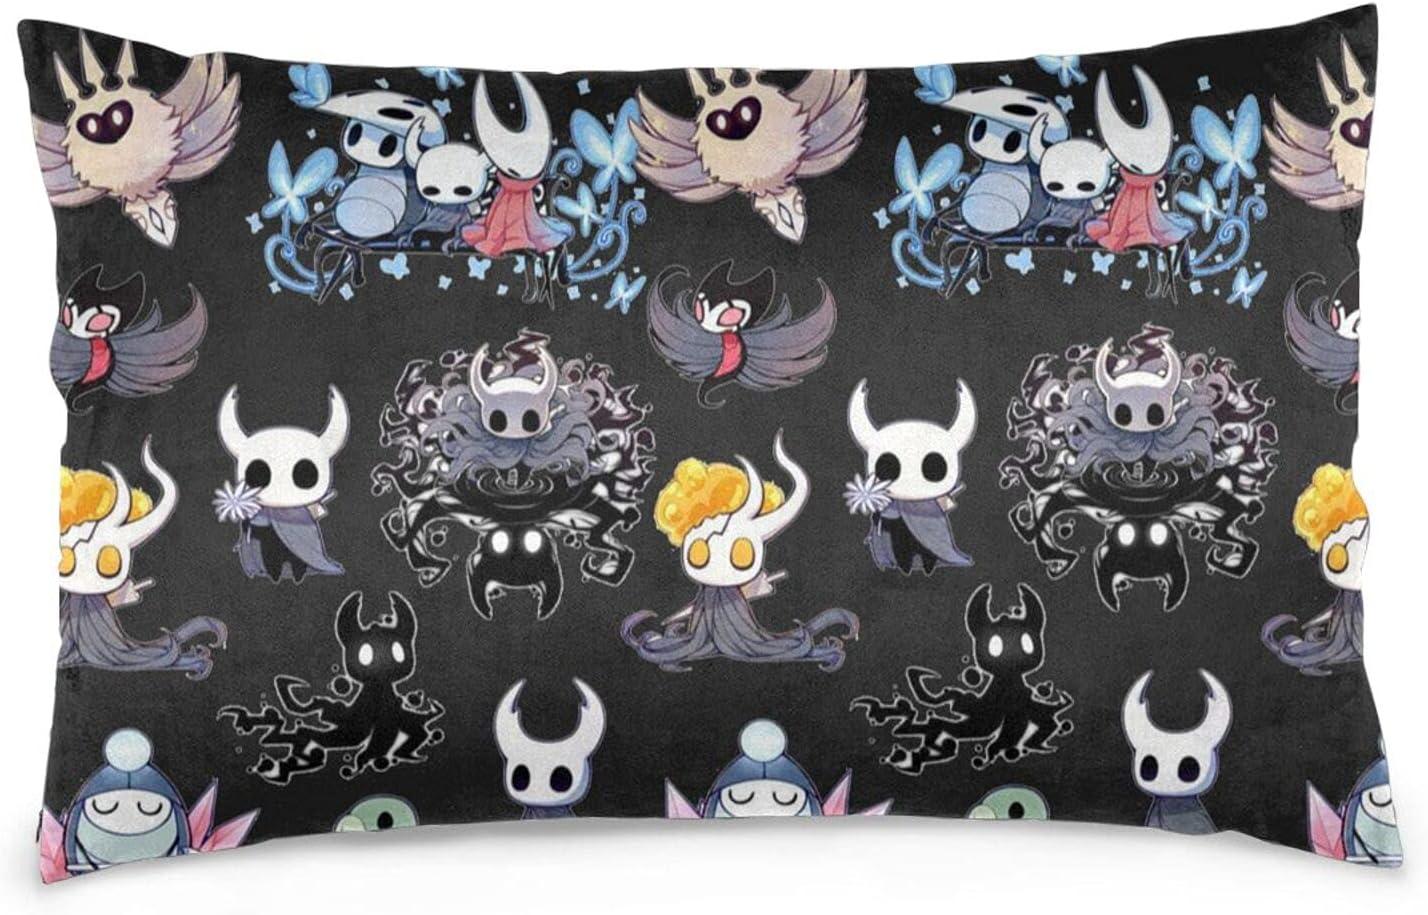 Hollow-Knight Pillow Cases Bedding SALENEW very popular Philadelphia Mall Zippers Hidden Anti-Wrinkl